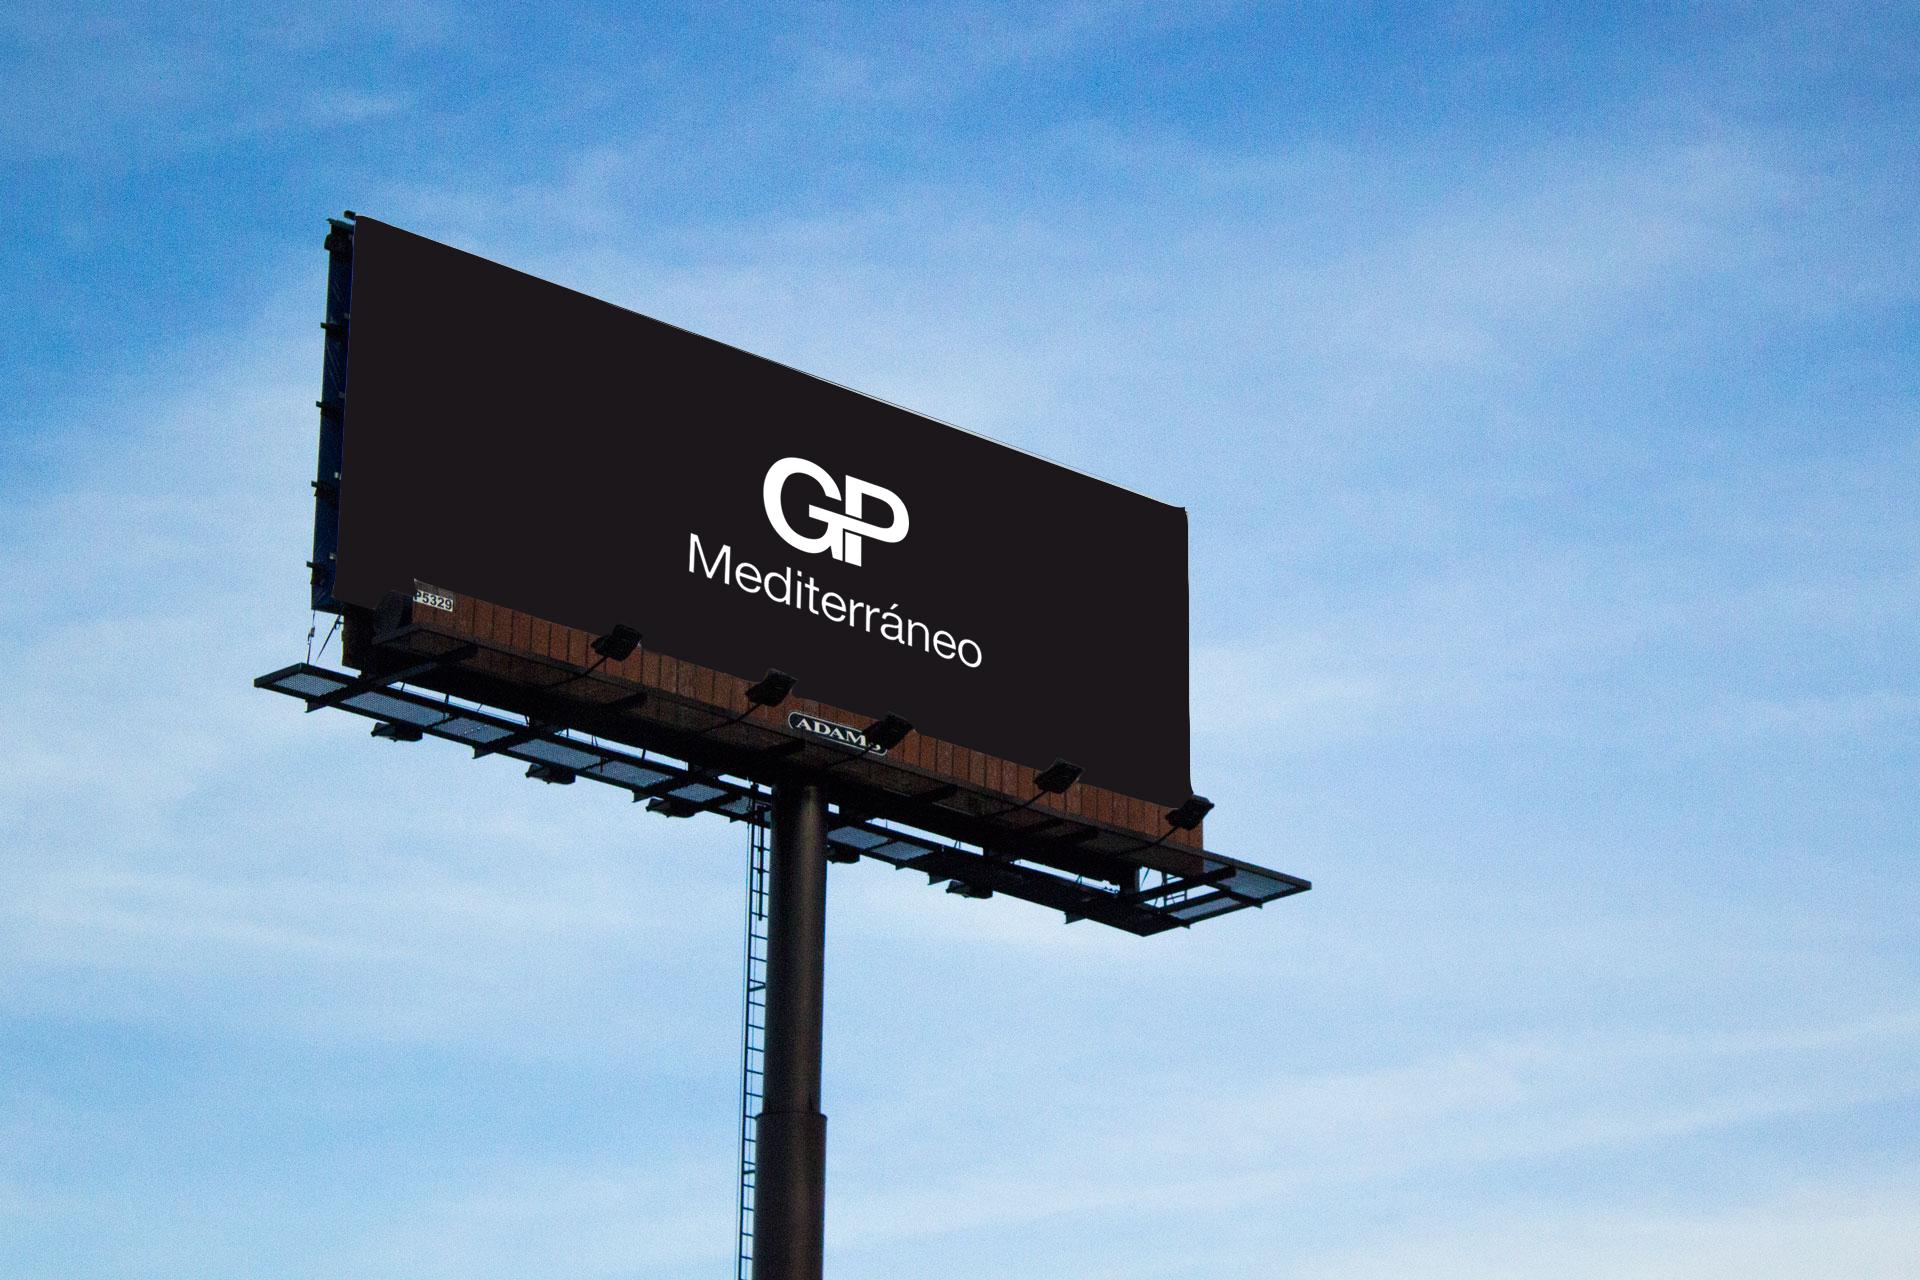 Monoposte Frontlight Valencia GP Mediterráneo